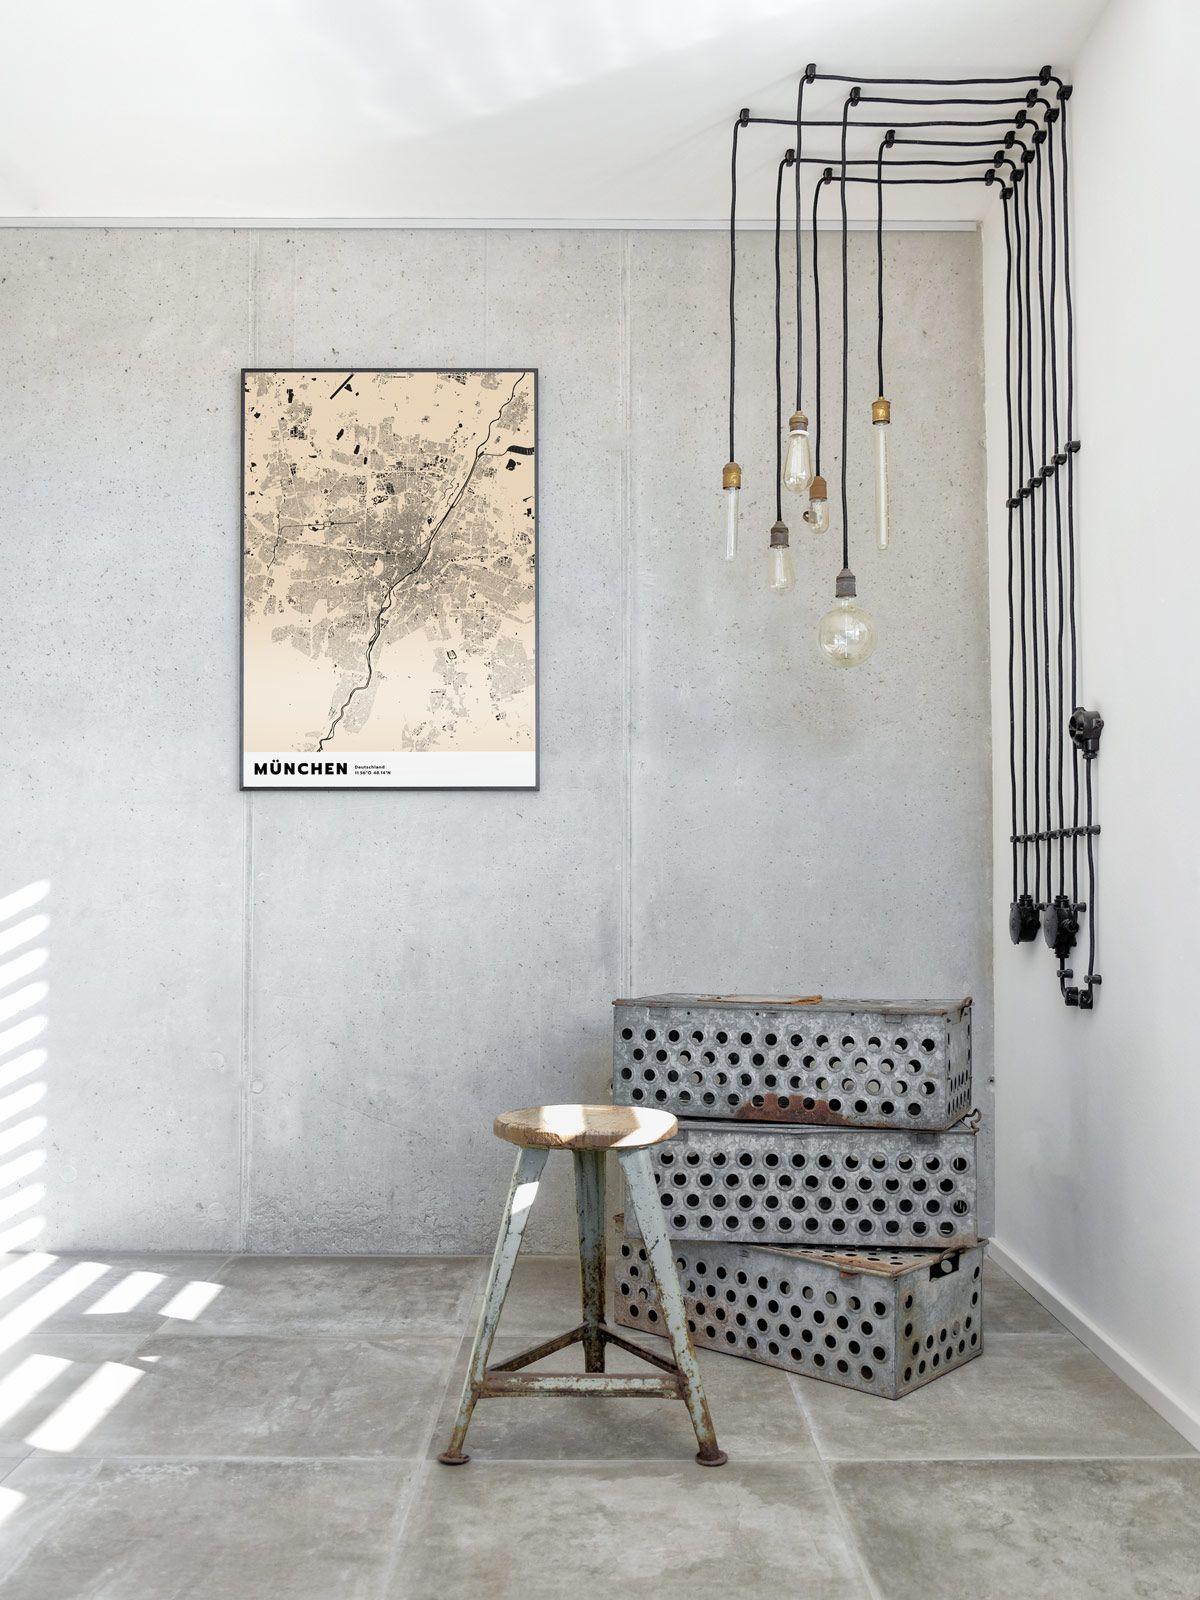 dekoration mx living dekoration dekoration w nde und wandgestaltung. Black Bedroom Furniture Sets. Home Design Ideas